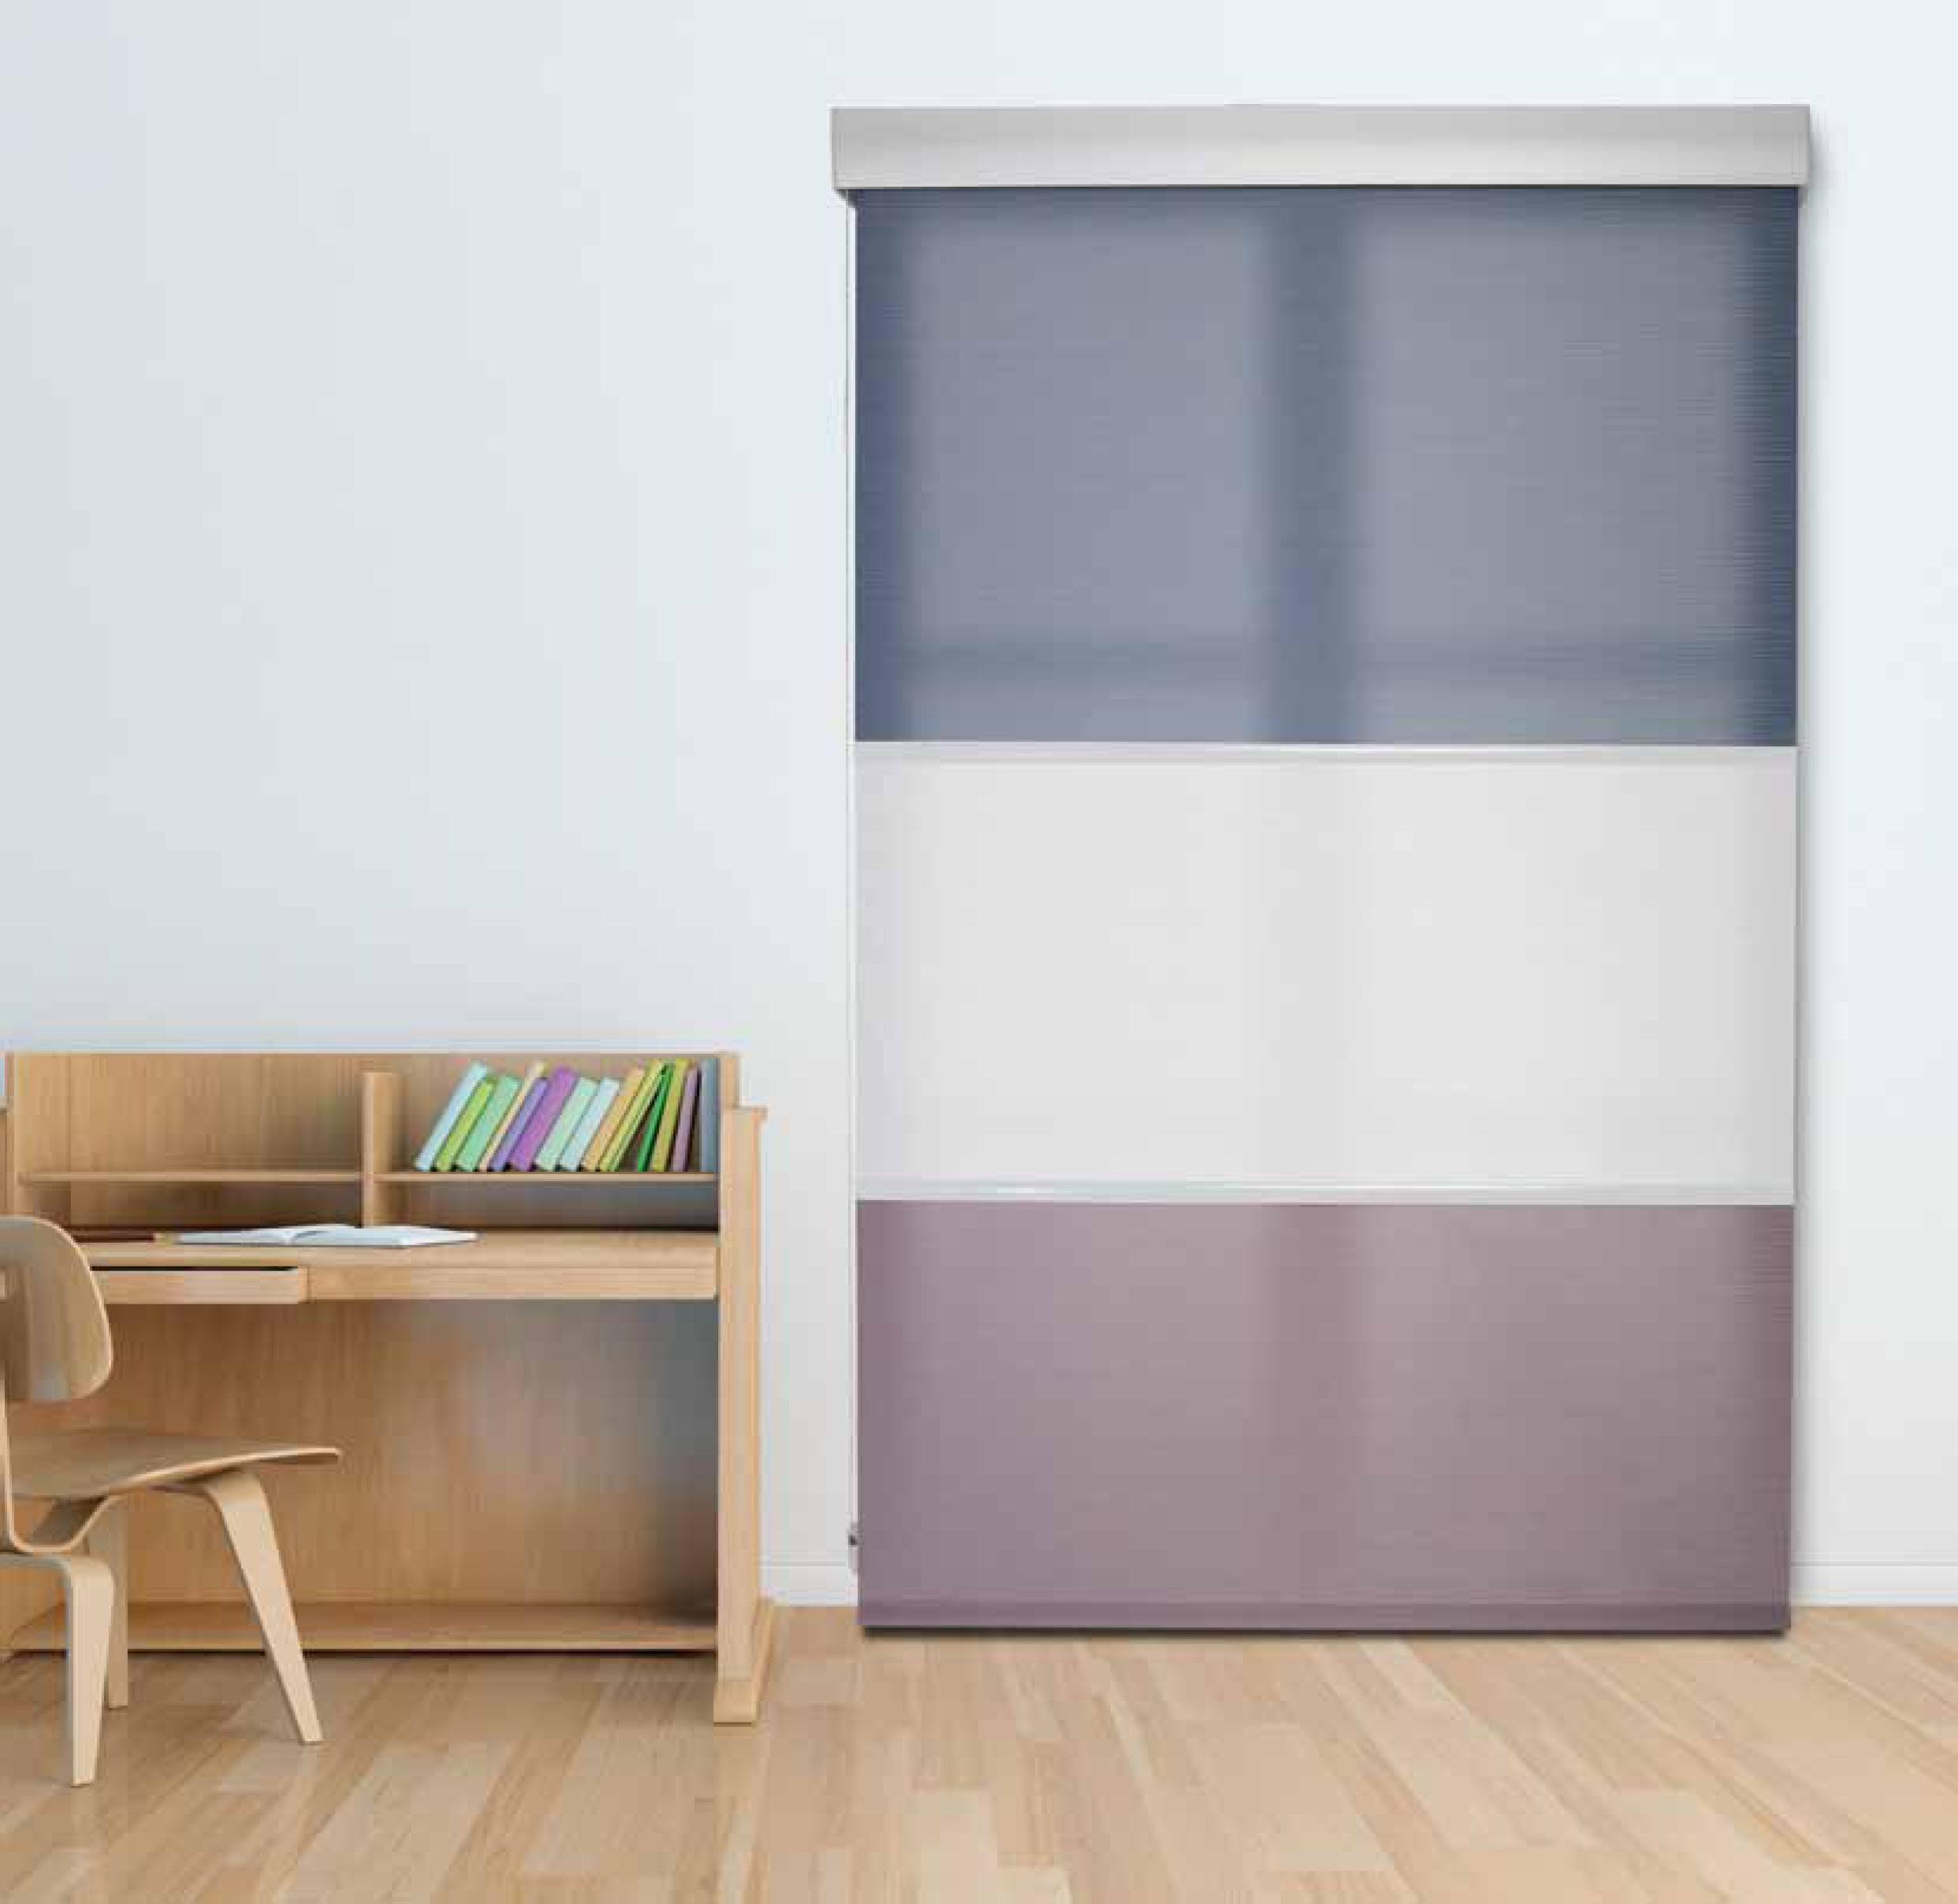 estores enrollables decorativos pasarella en zaragoza. Black Bedroom Furniture Sets. Home Design Ideas